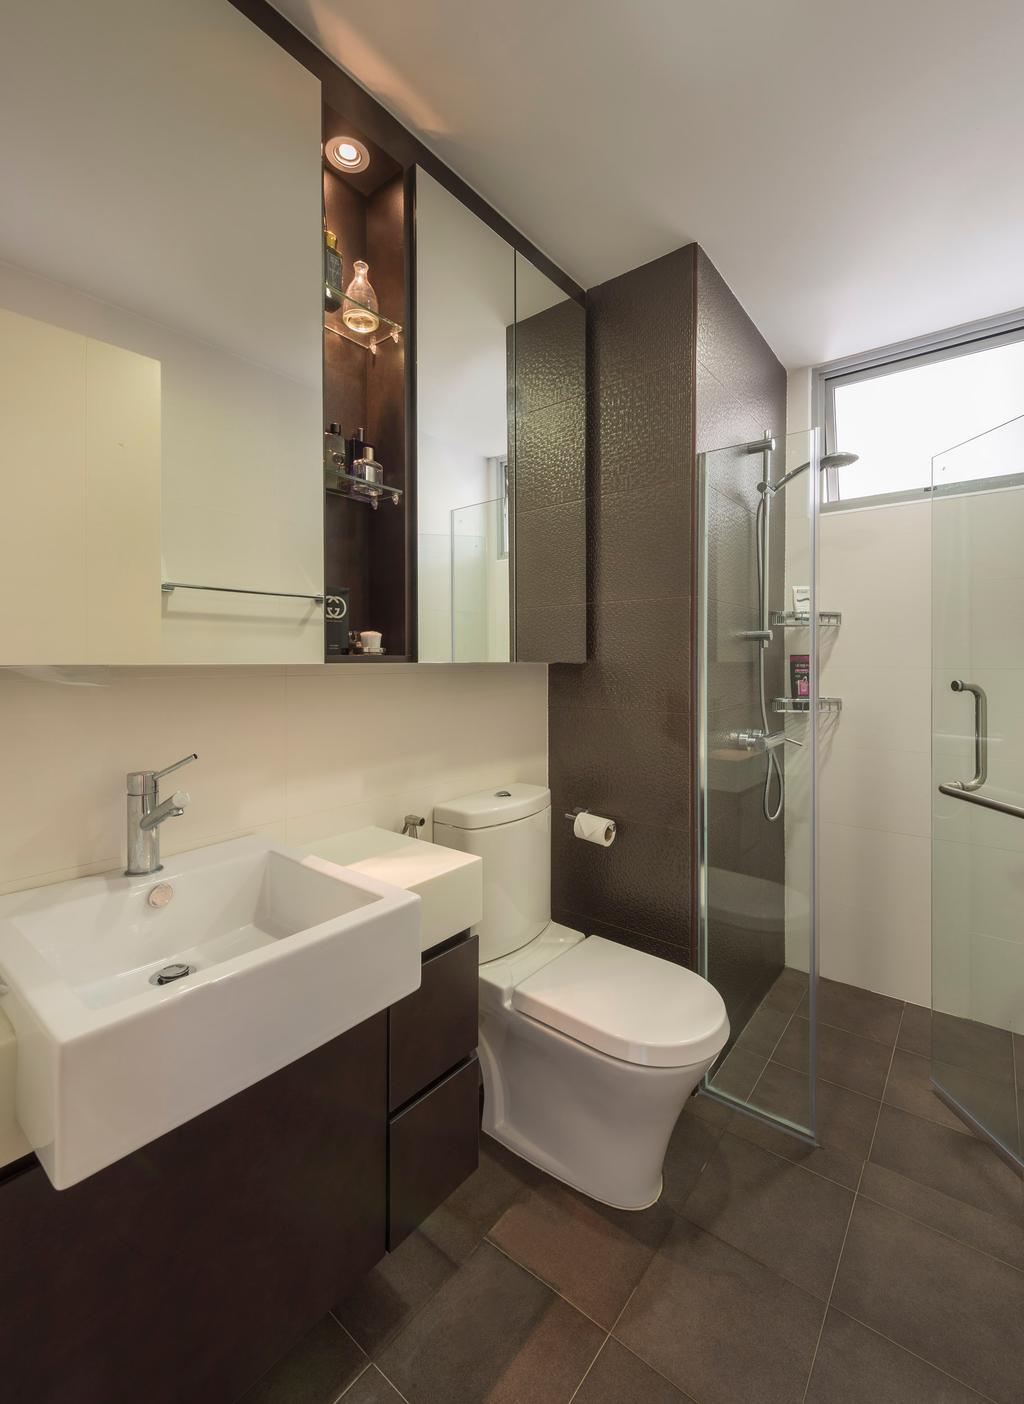 Contemporary, Condo, Bathroom, De Royale, Interior Designer, Space Factor, Bathroom Counter, Glass Cubicle, Mirror, Shelf, Shelves, Vessel Sink, Tile, Tiles, Brown, Indoors, Interior Design, Room